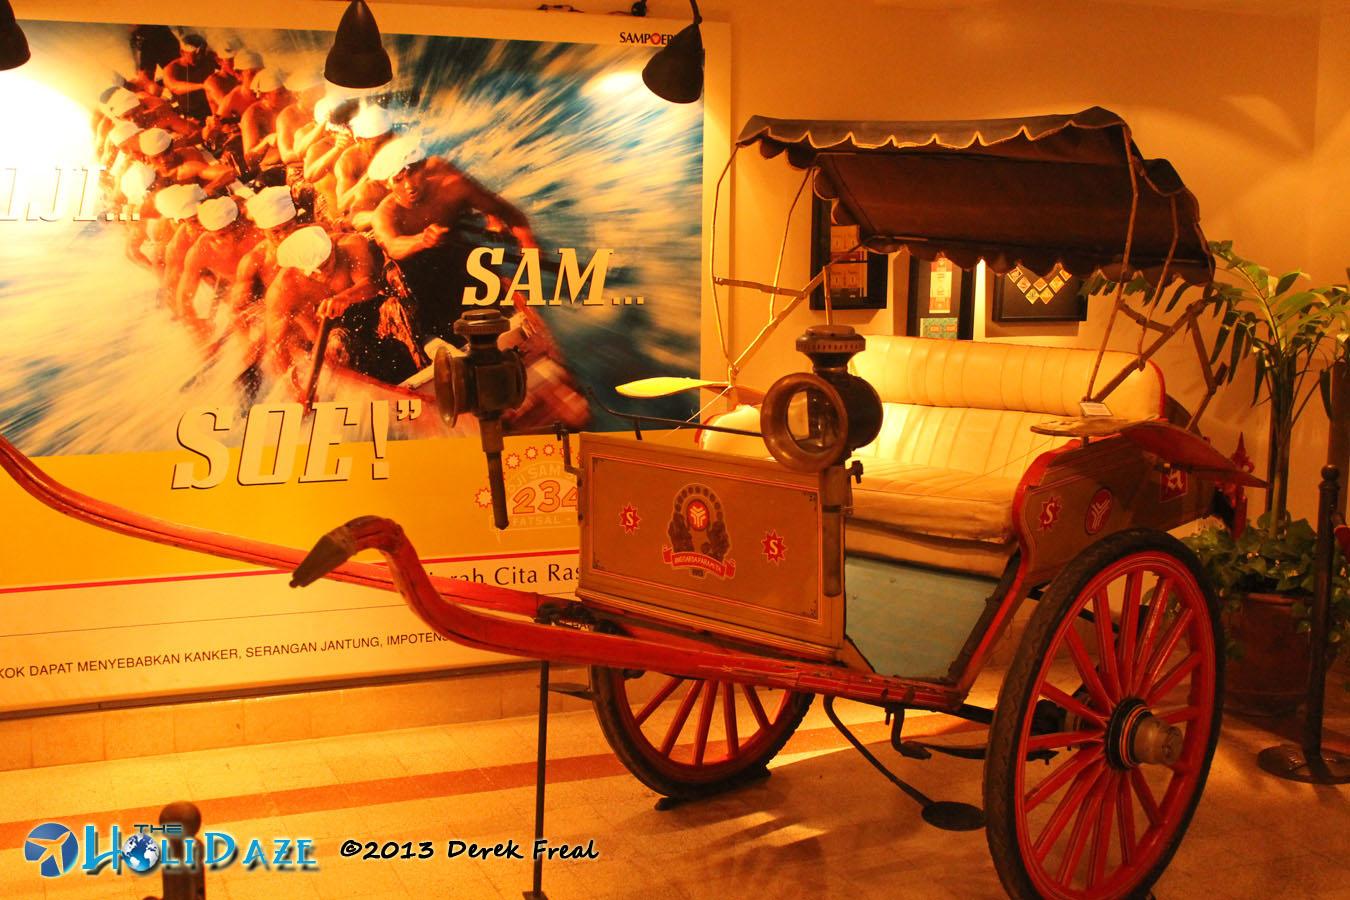 House Of Sampoerna Chariot